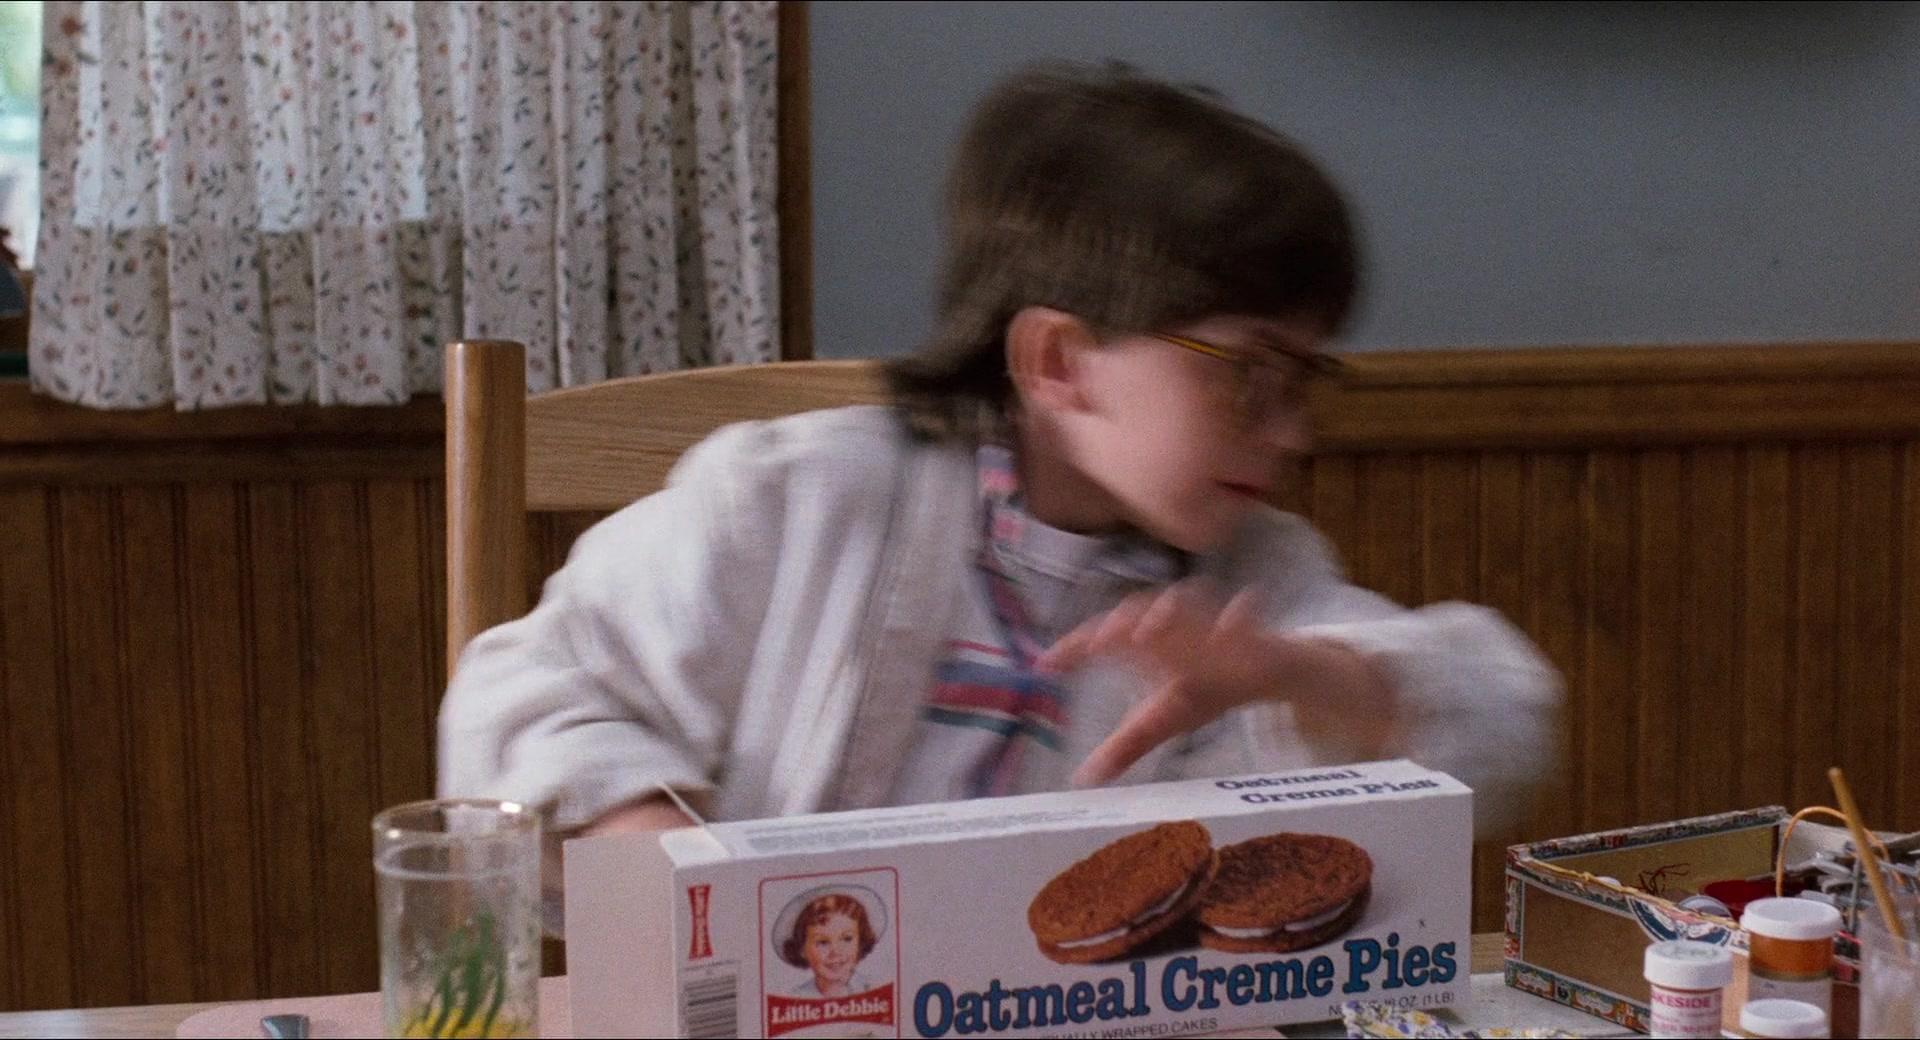 Little Debbie Oatmeal Creme Pies In Honey I Shrunk The Kids 1989